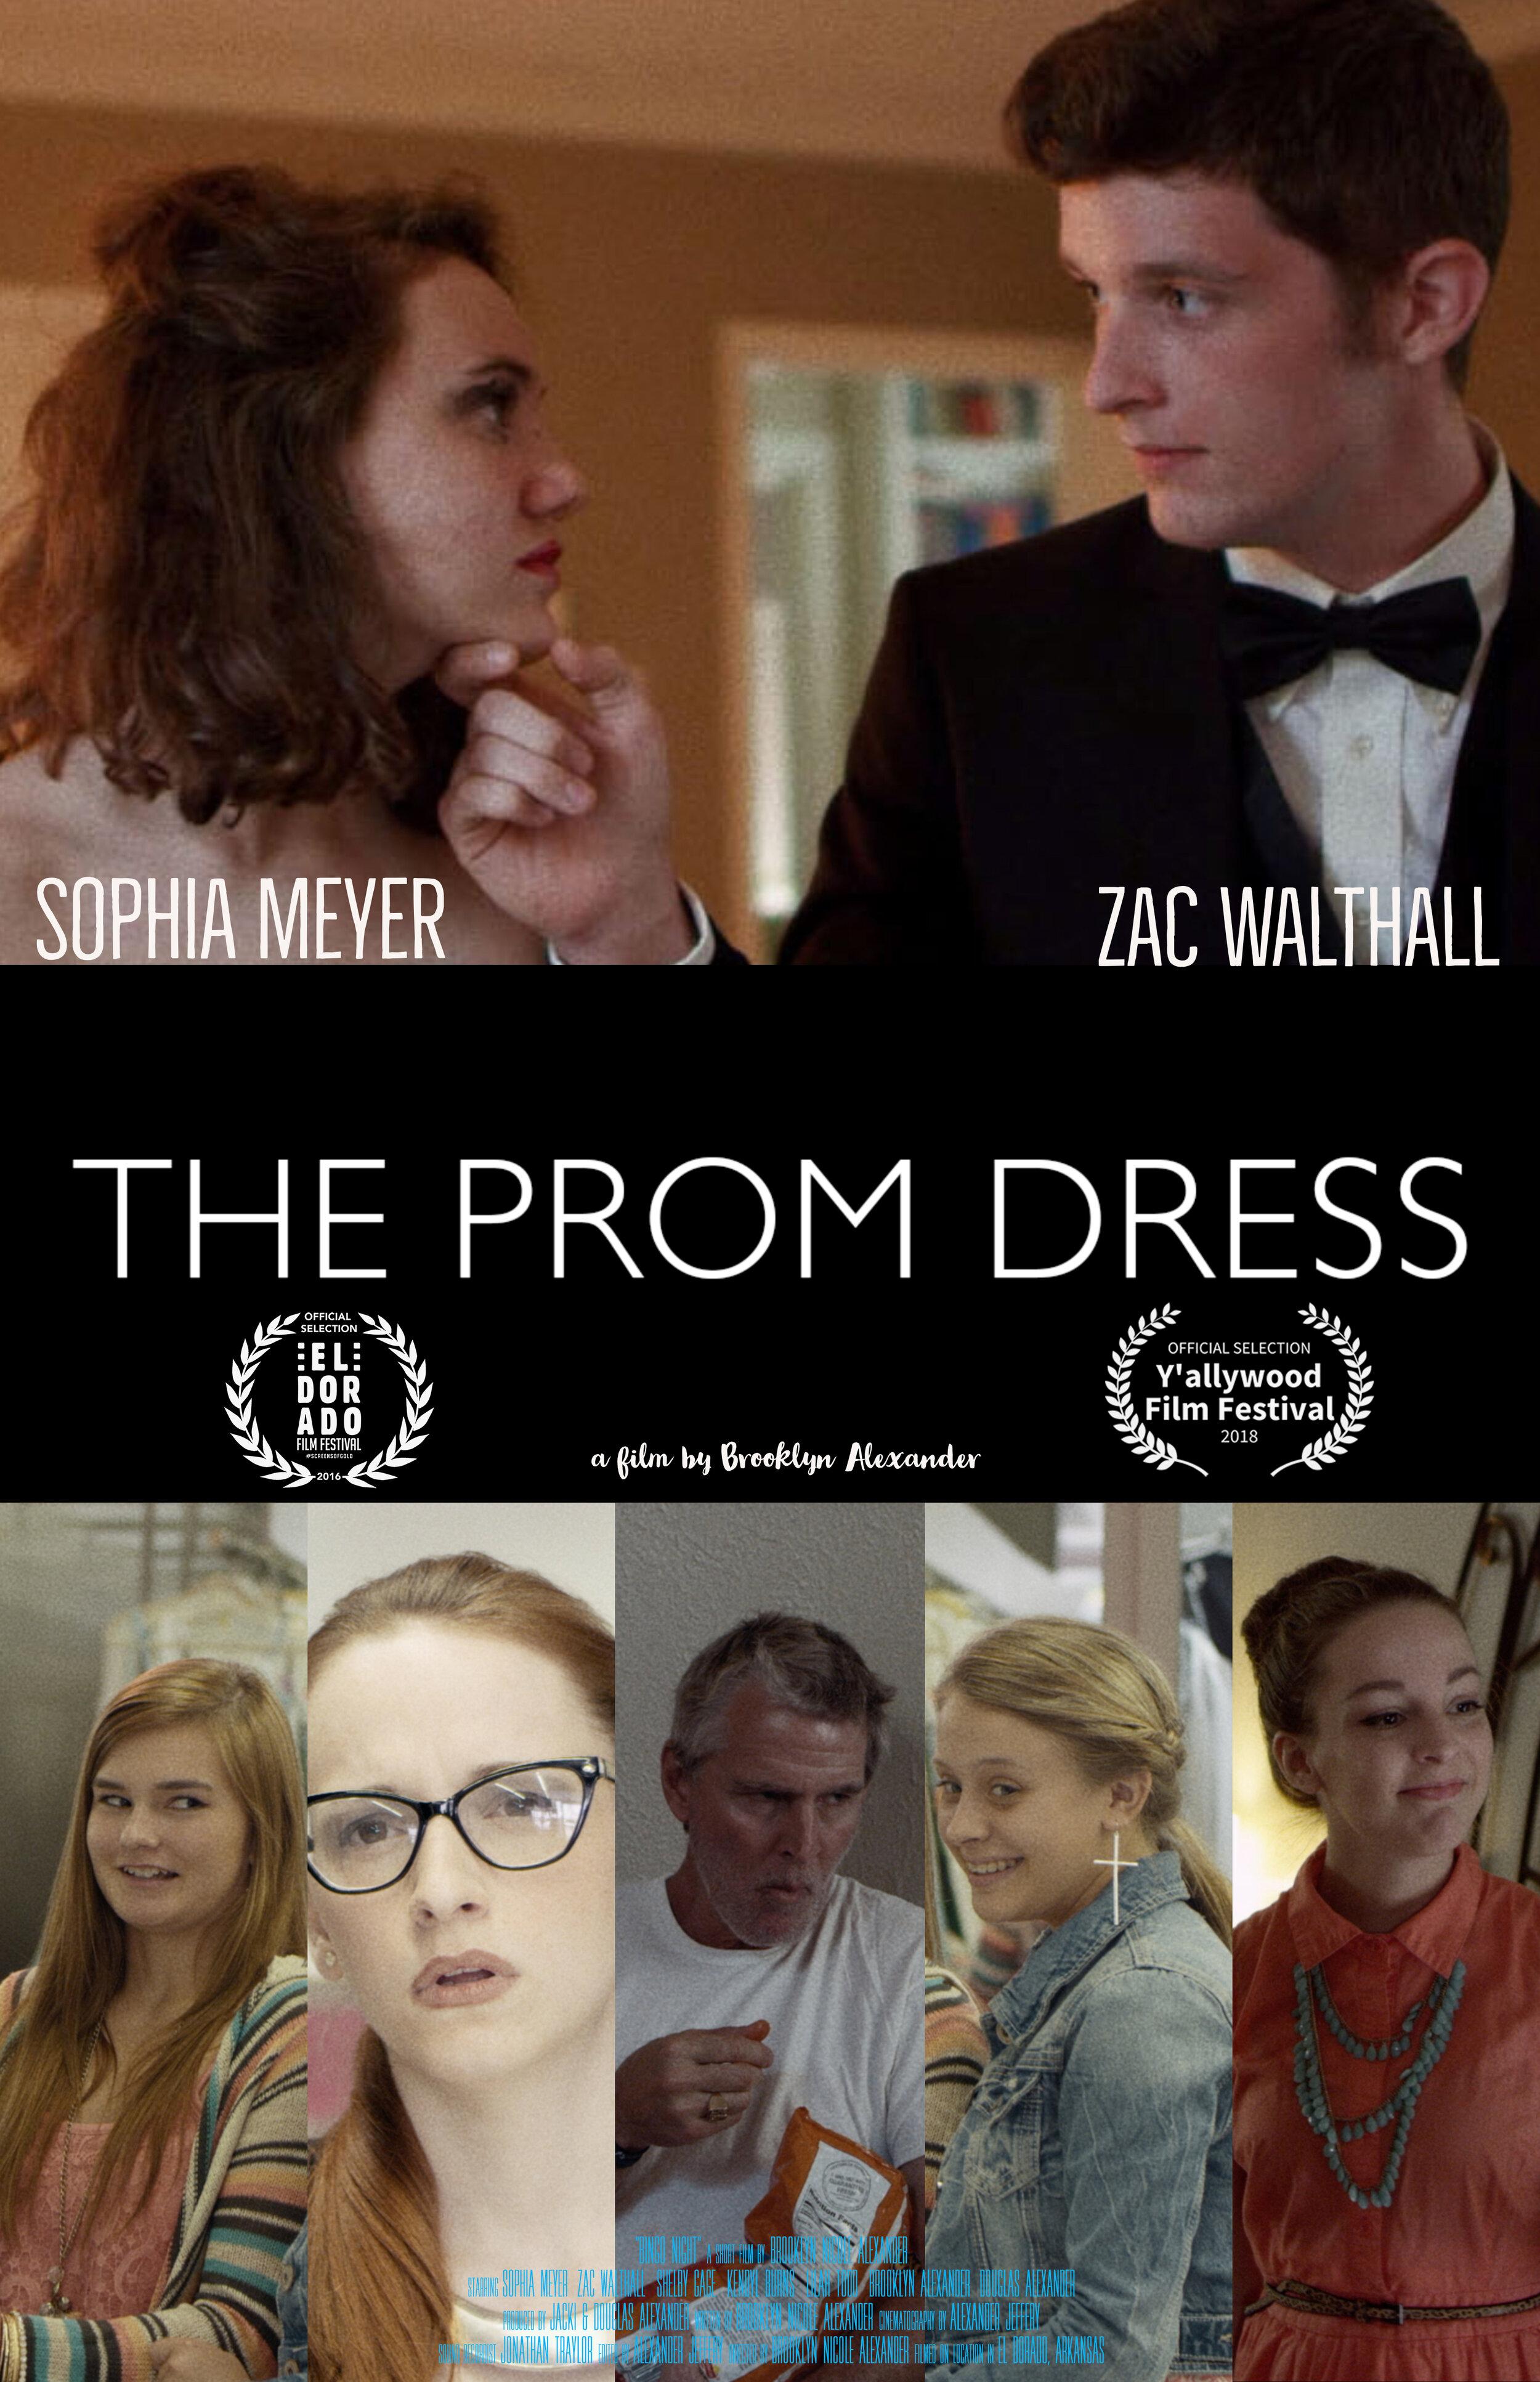 Brooklyn Alexander - The Prom Dress poster 1_BrooklynAlexander.jpg